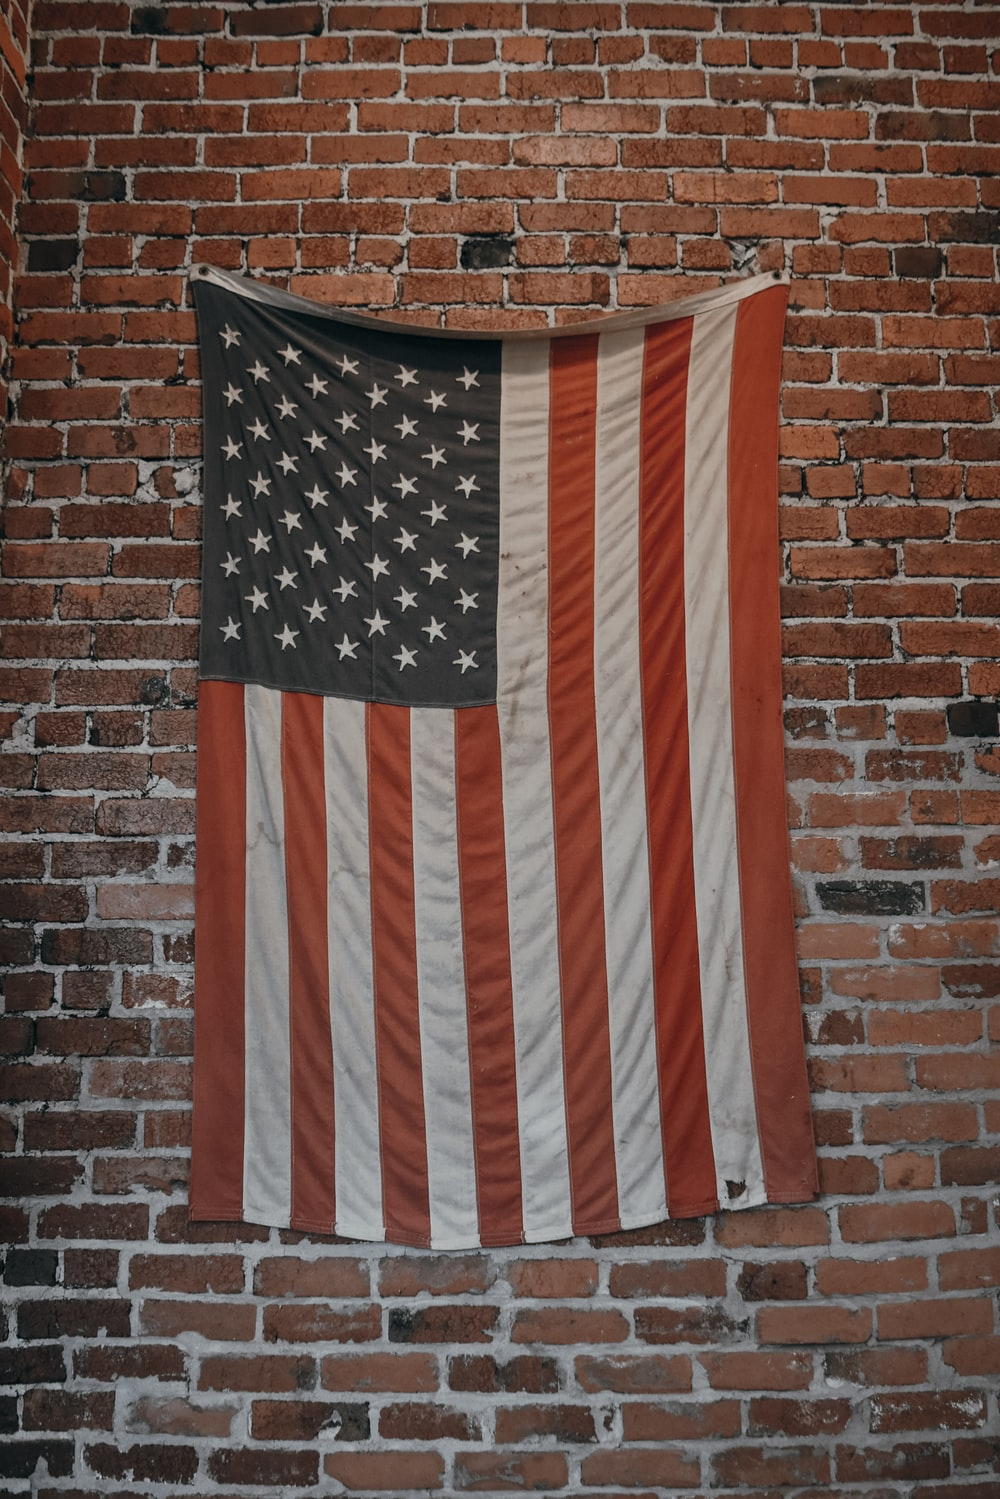 U.S.A. flag hanged on brown brick wall